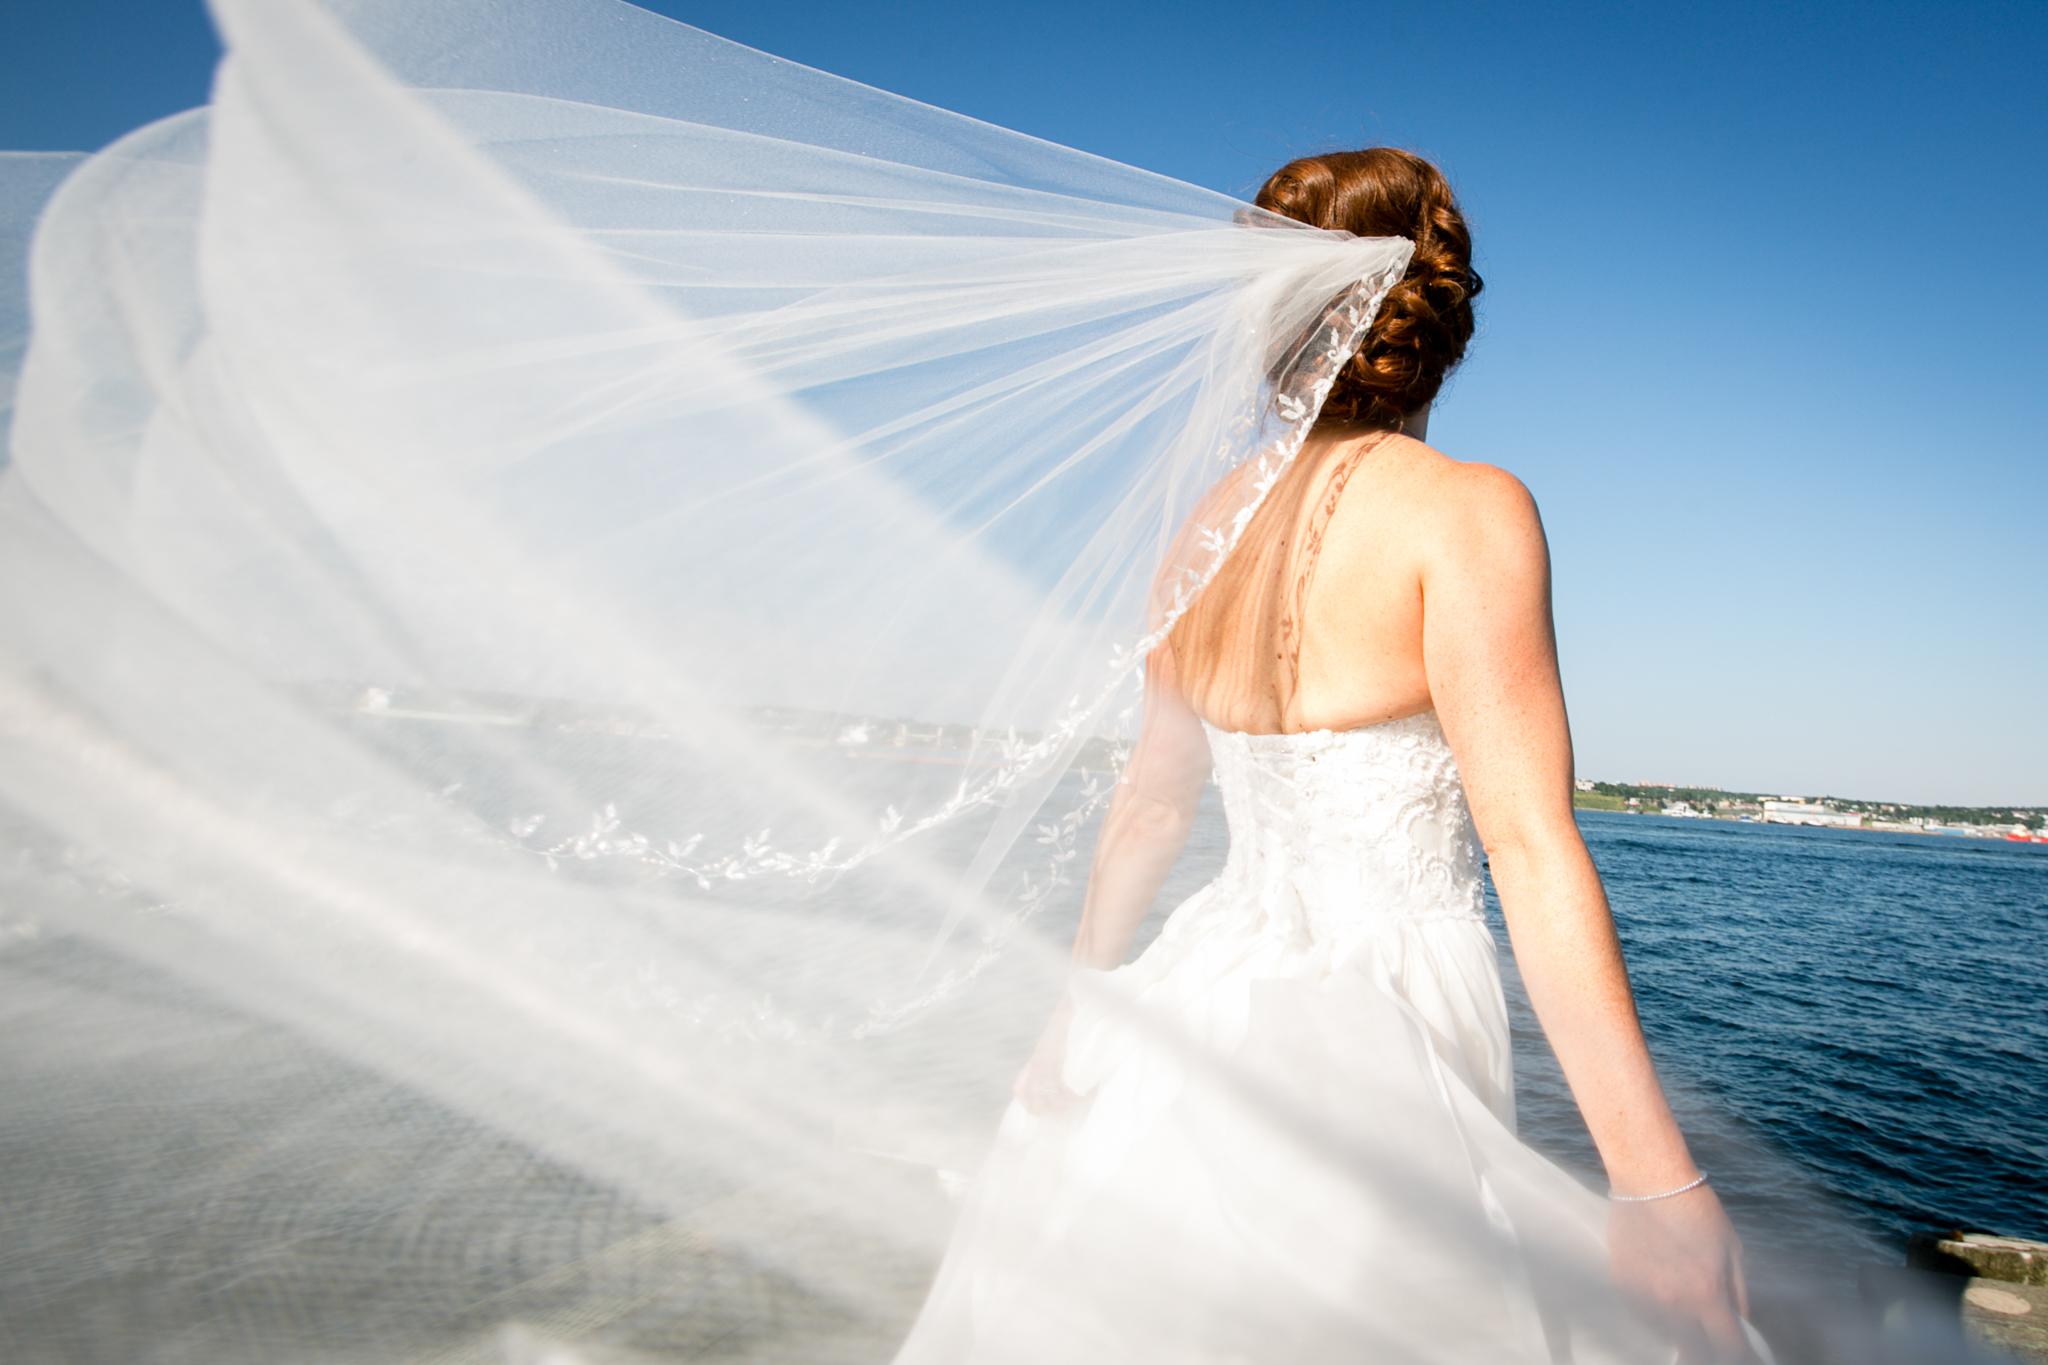 12-LORD-NELSON-WEDDING-VENUE-HALIFAX.jpg